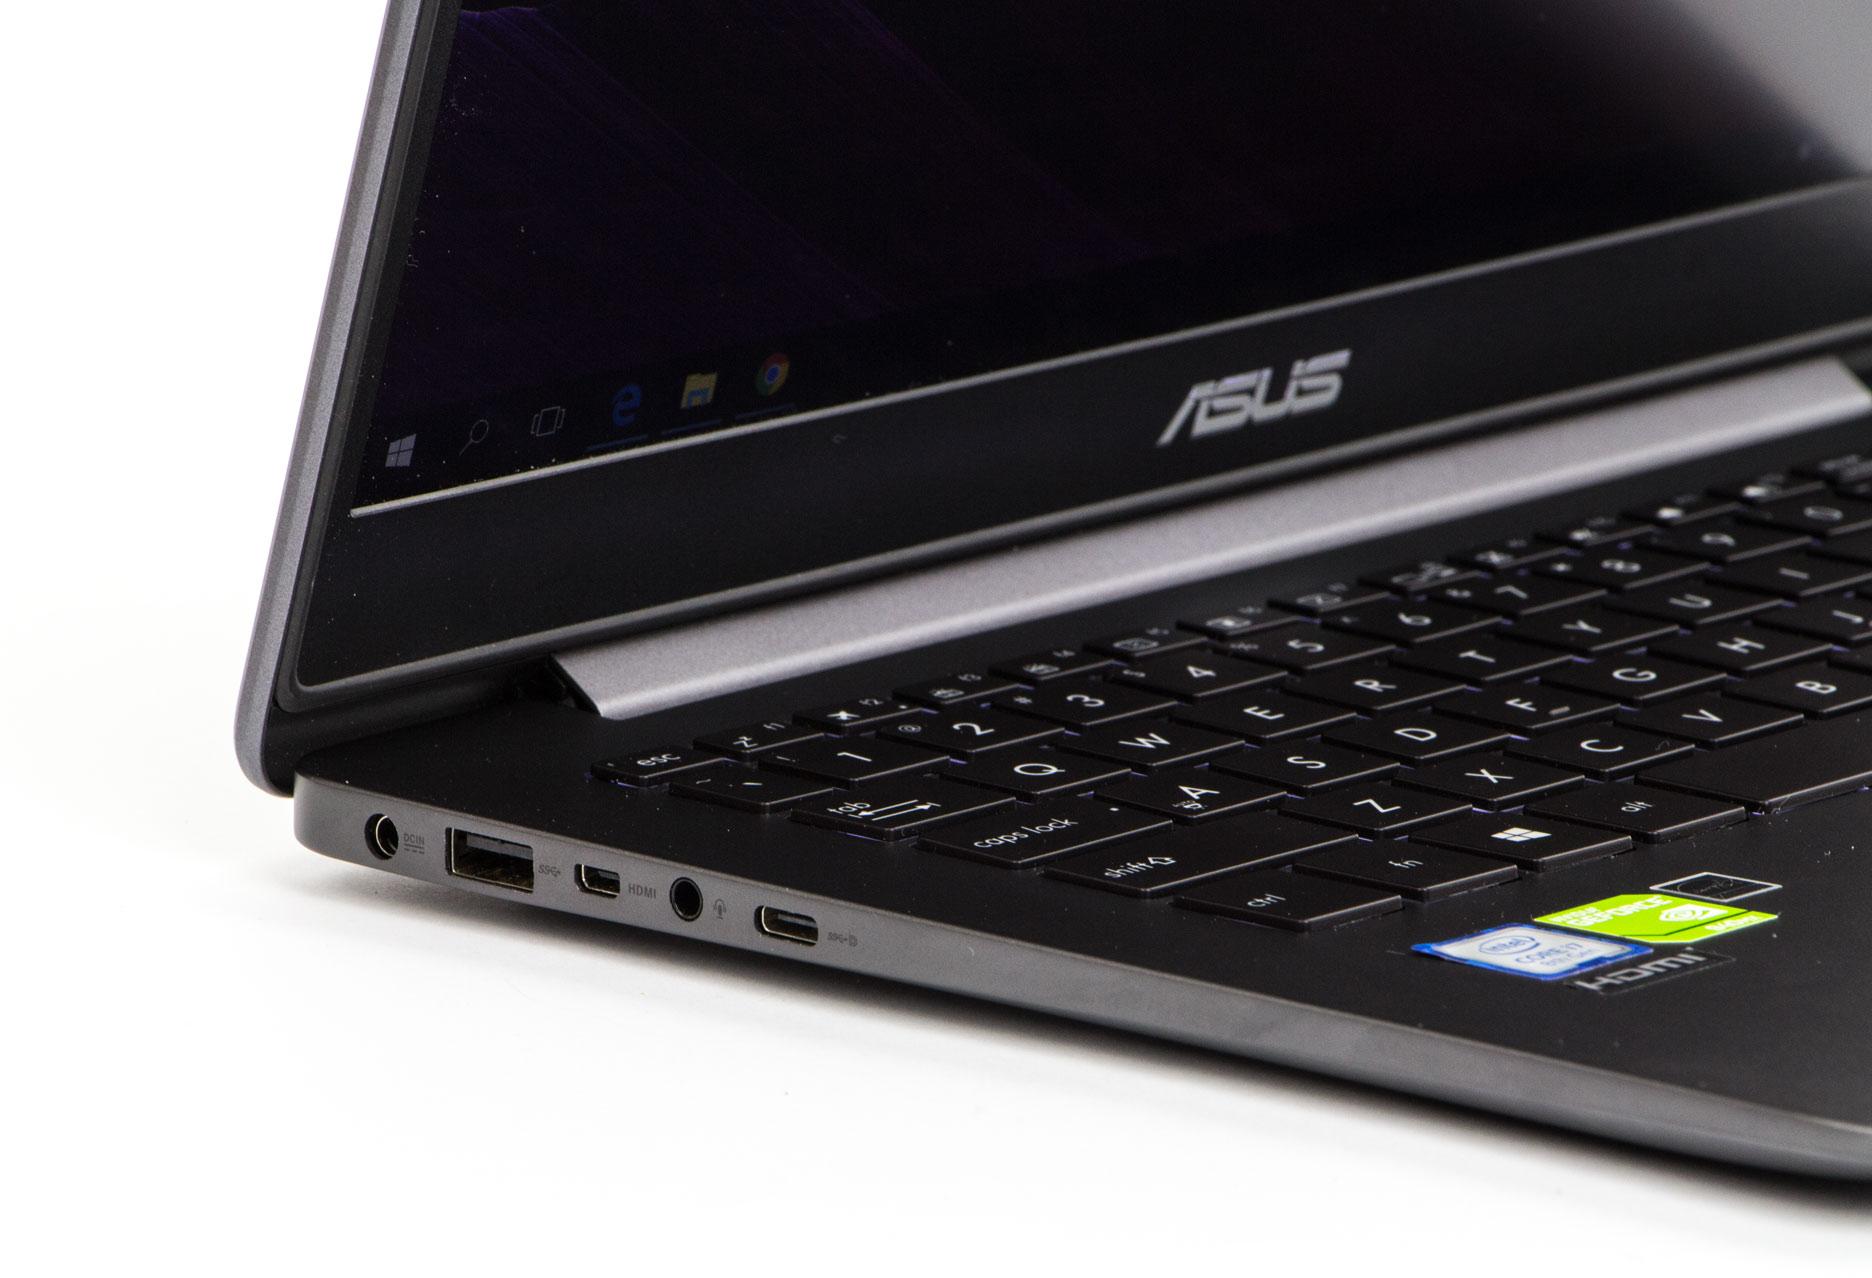 Asus Zenbook UX430U lewa strona